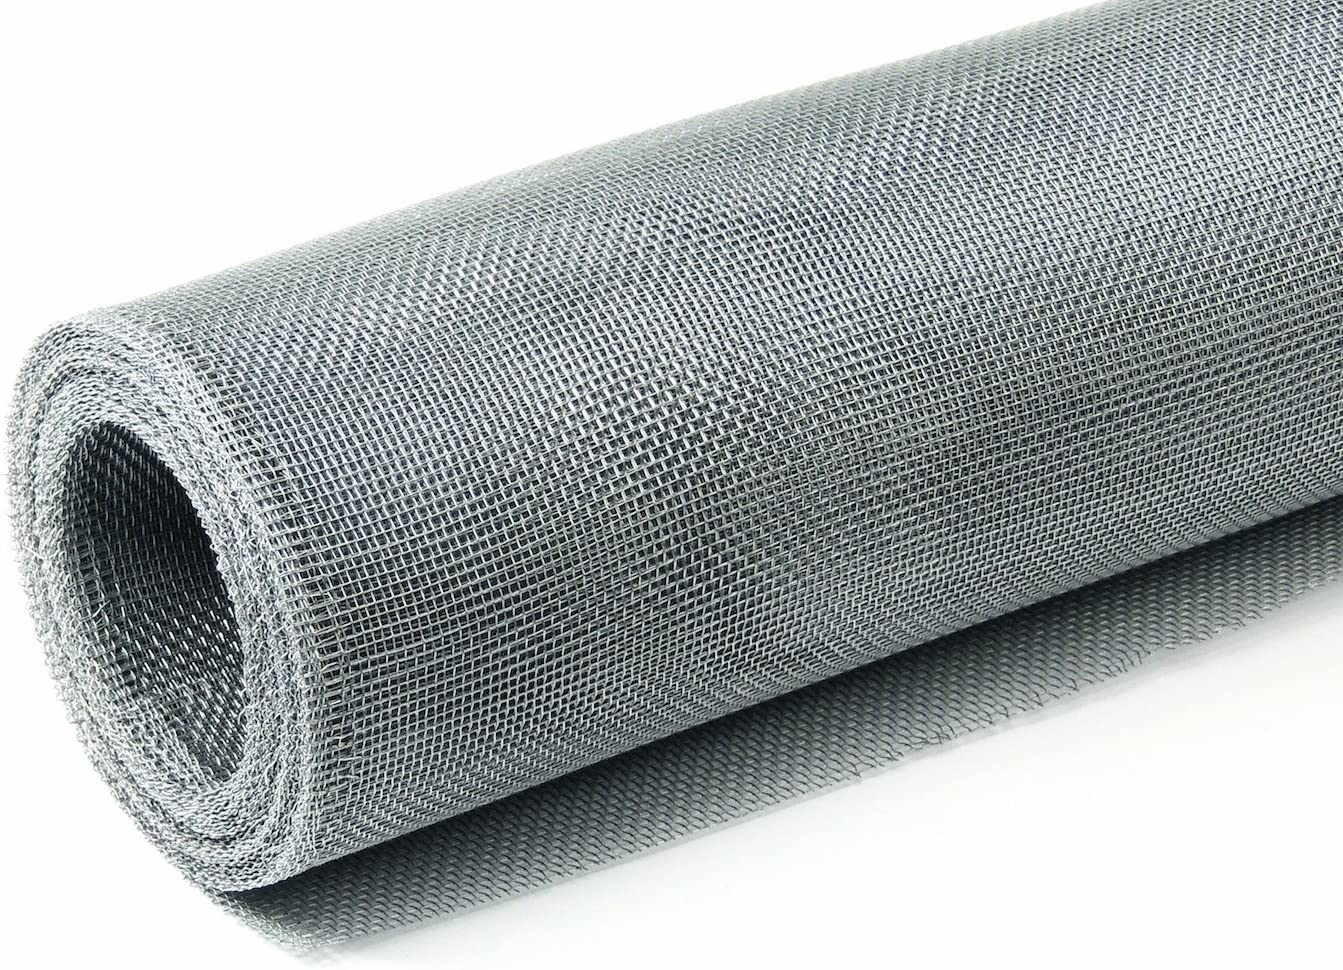 Aluminiumgewebe Alu-Gewebe Fliegengitter Gewebe 1,0 x 30,0 m Grundpreis//m/² 4,78 Euro